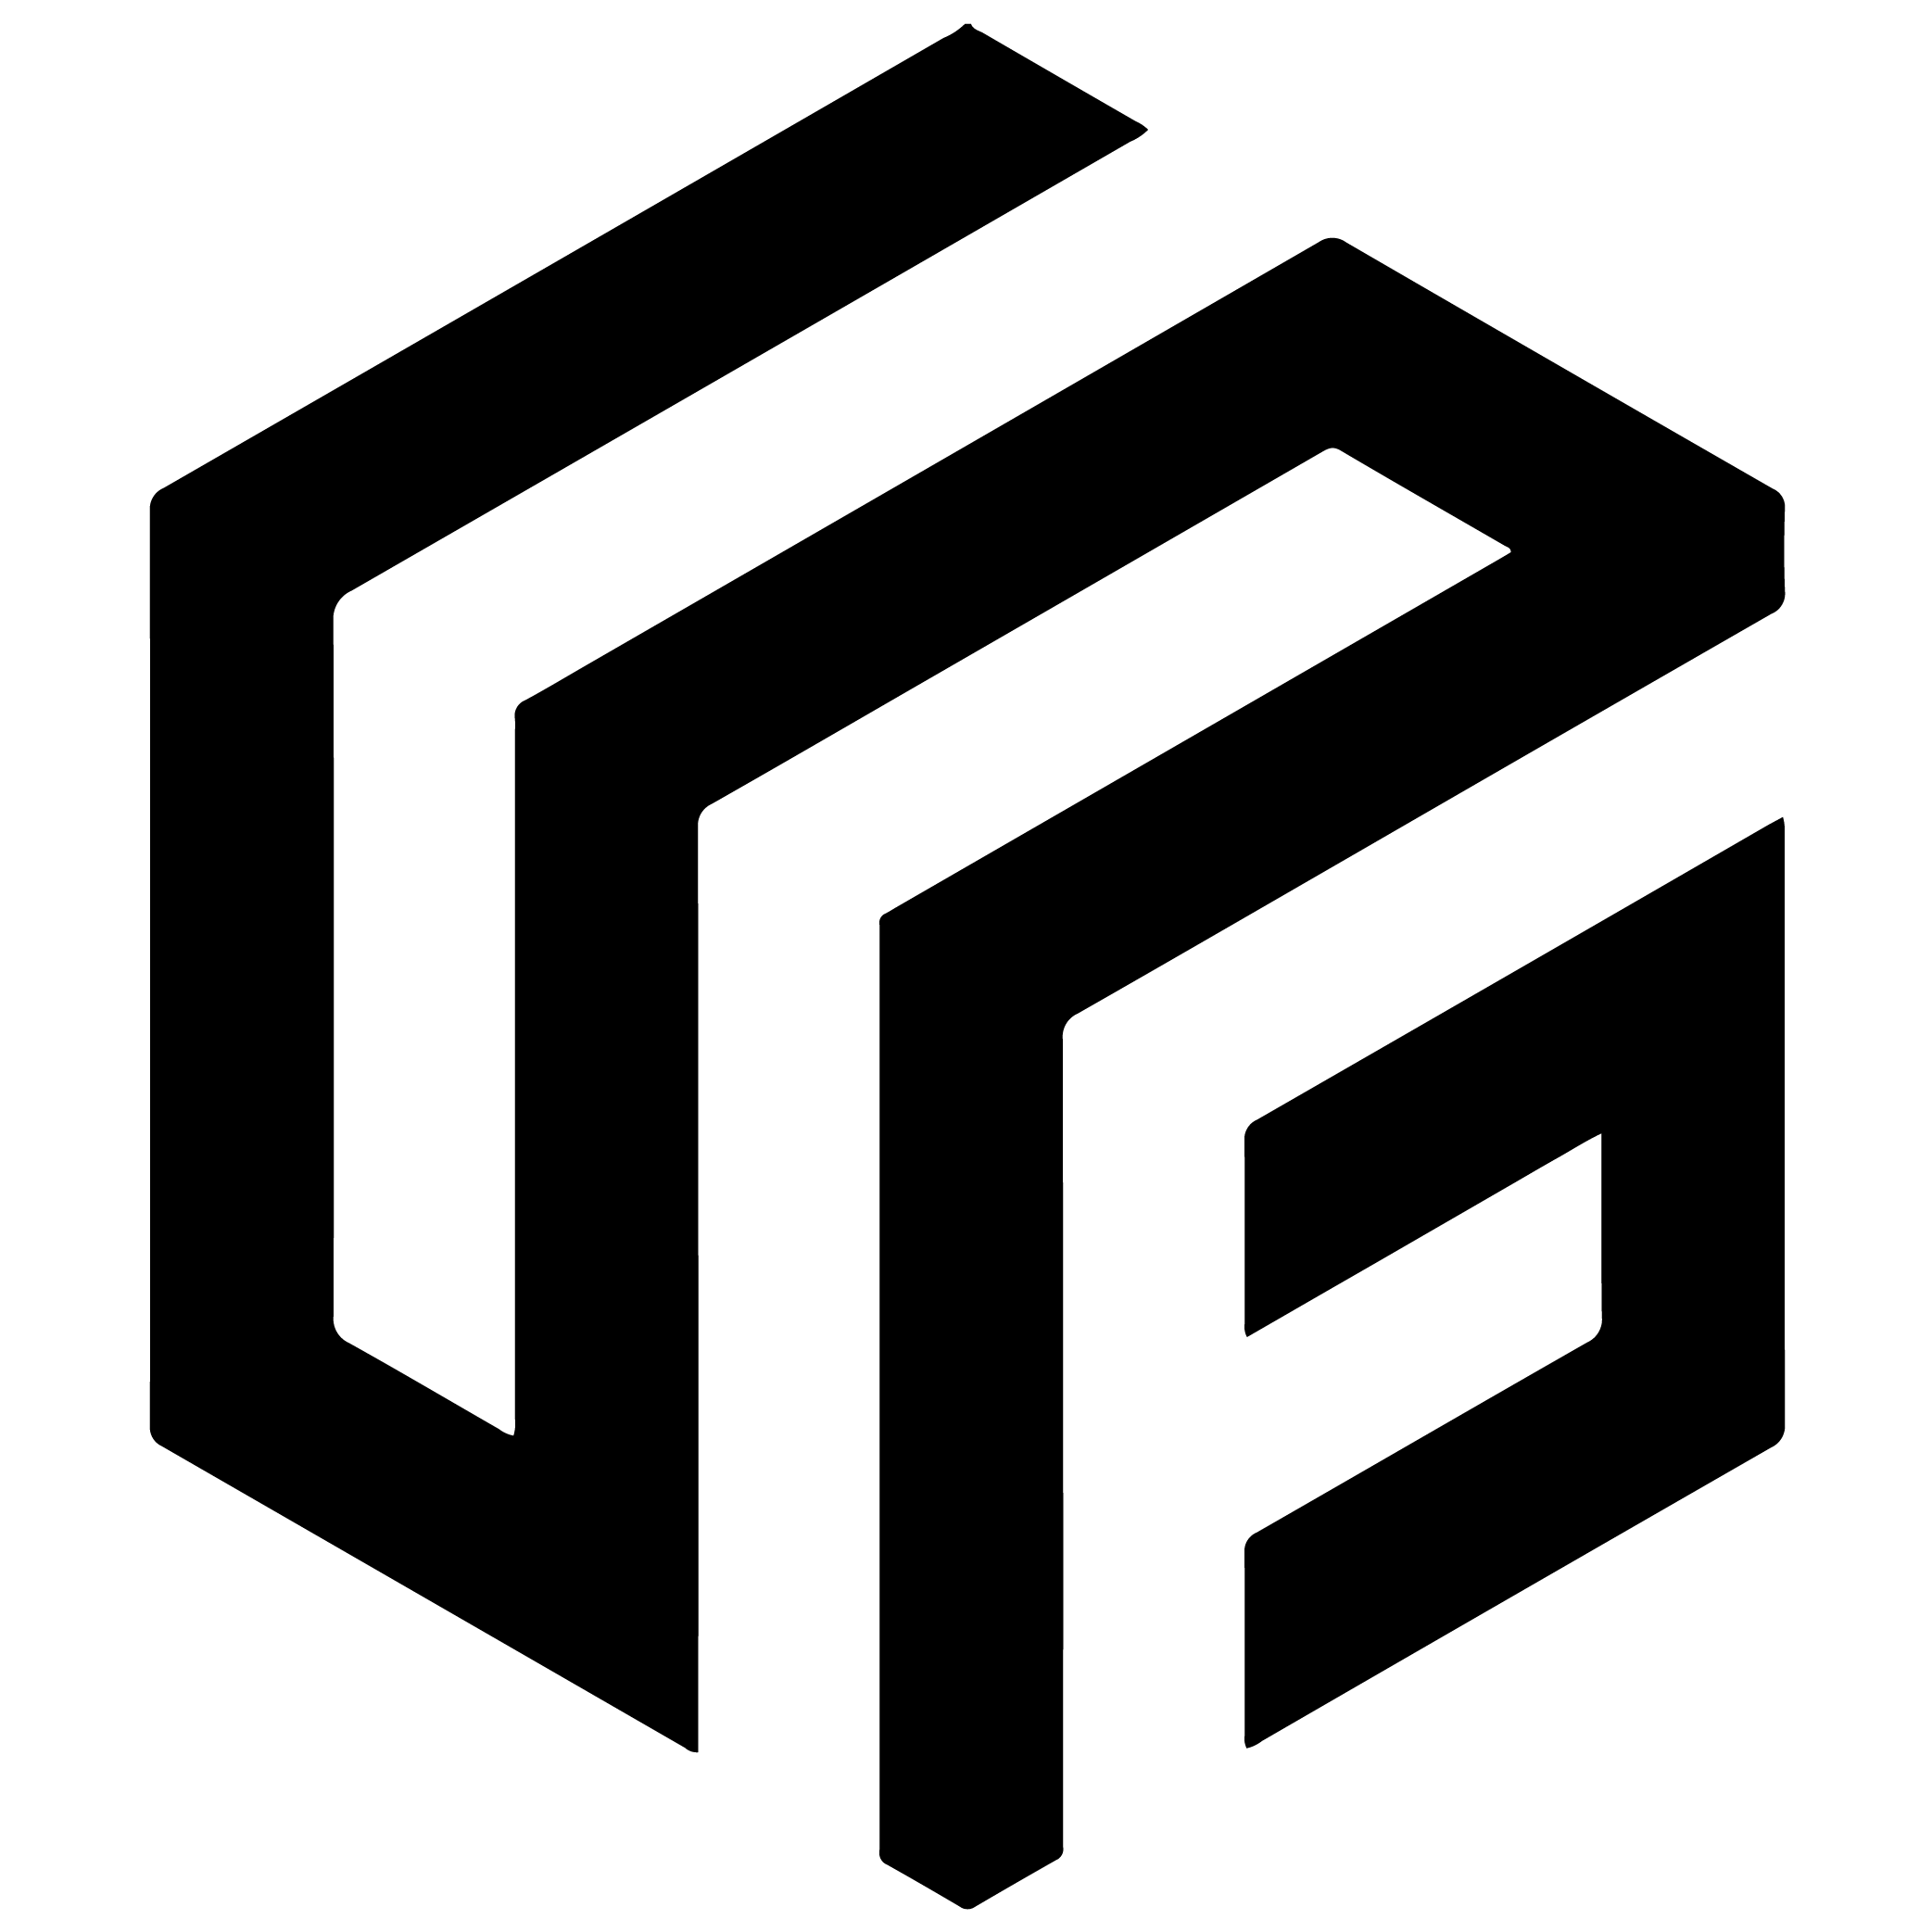 Feast icon black